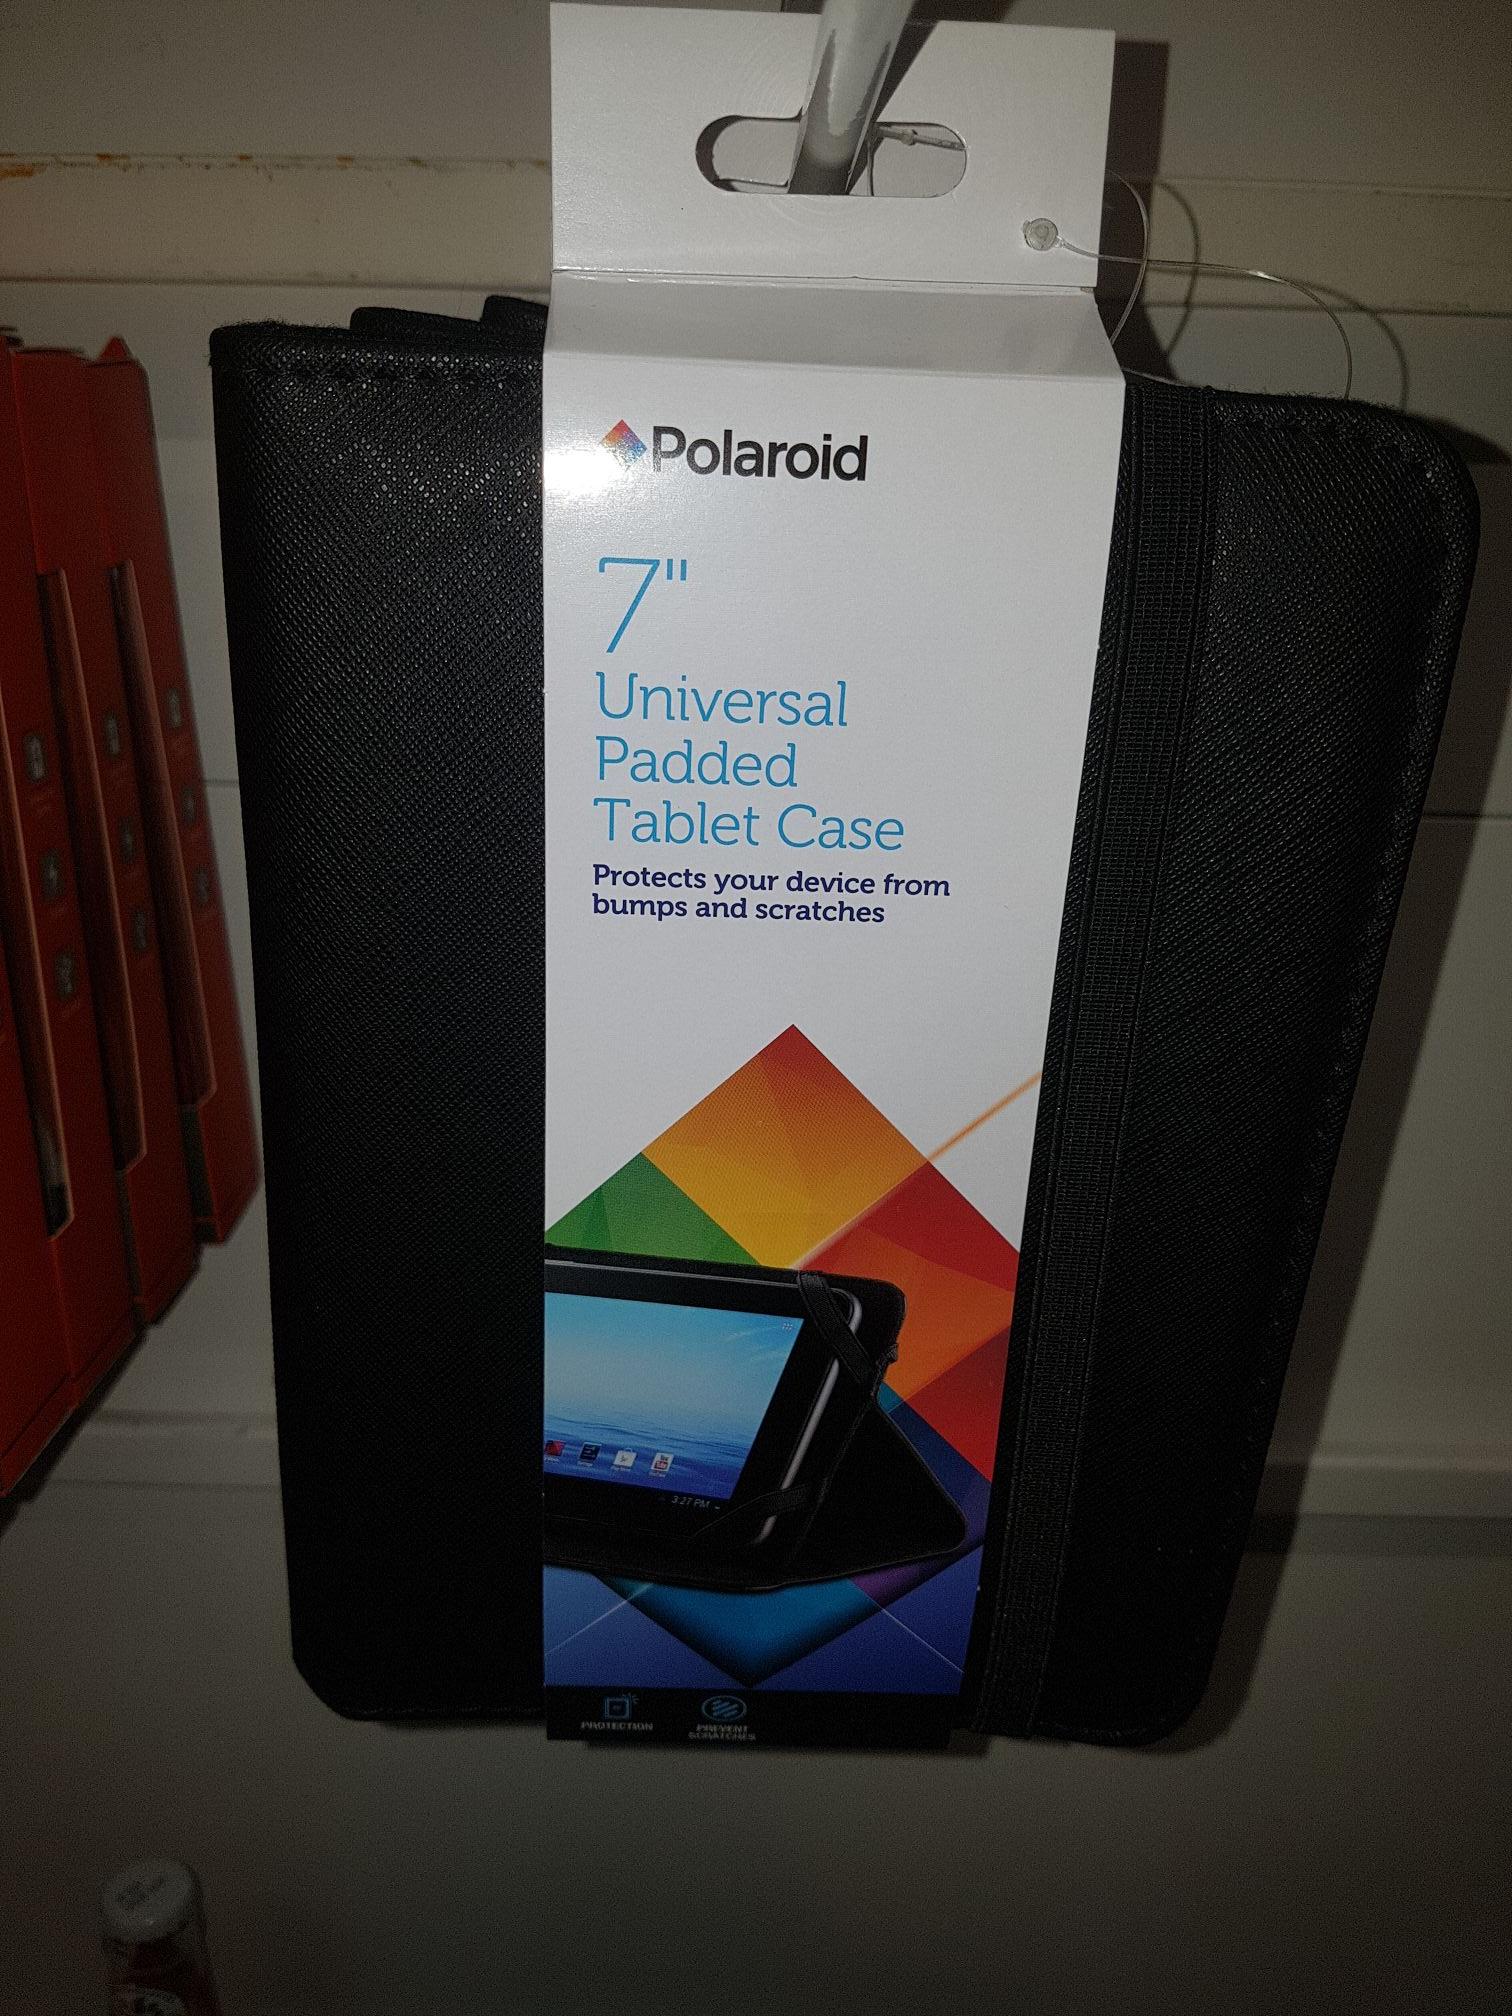 Polaroid universal tablet case 70p instore @ asda